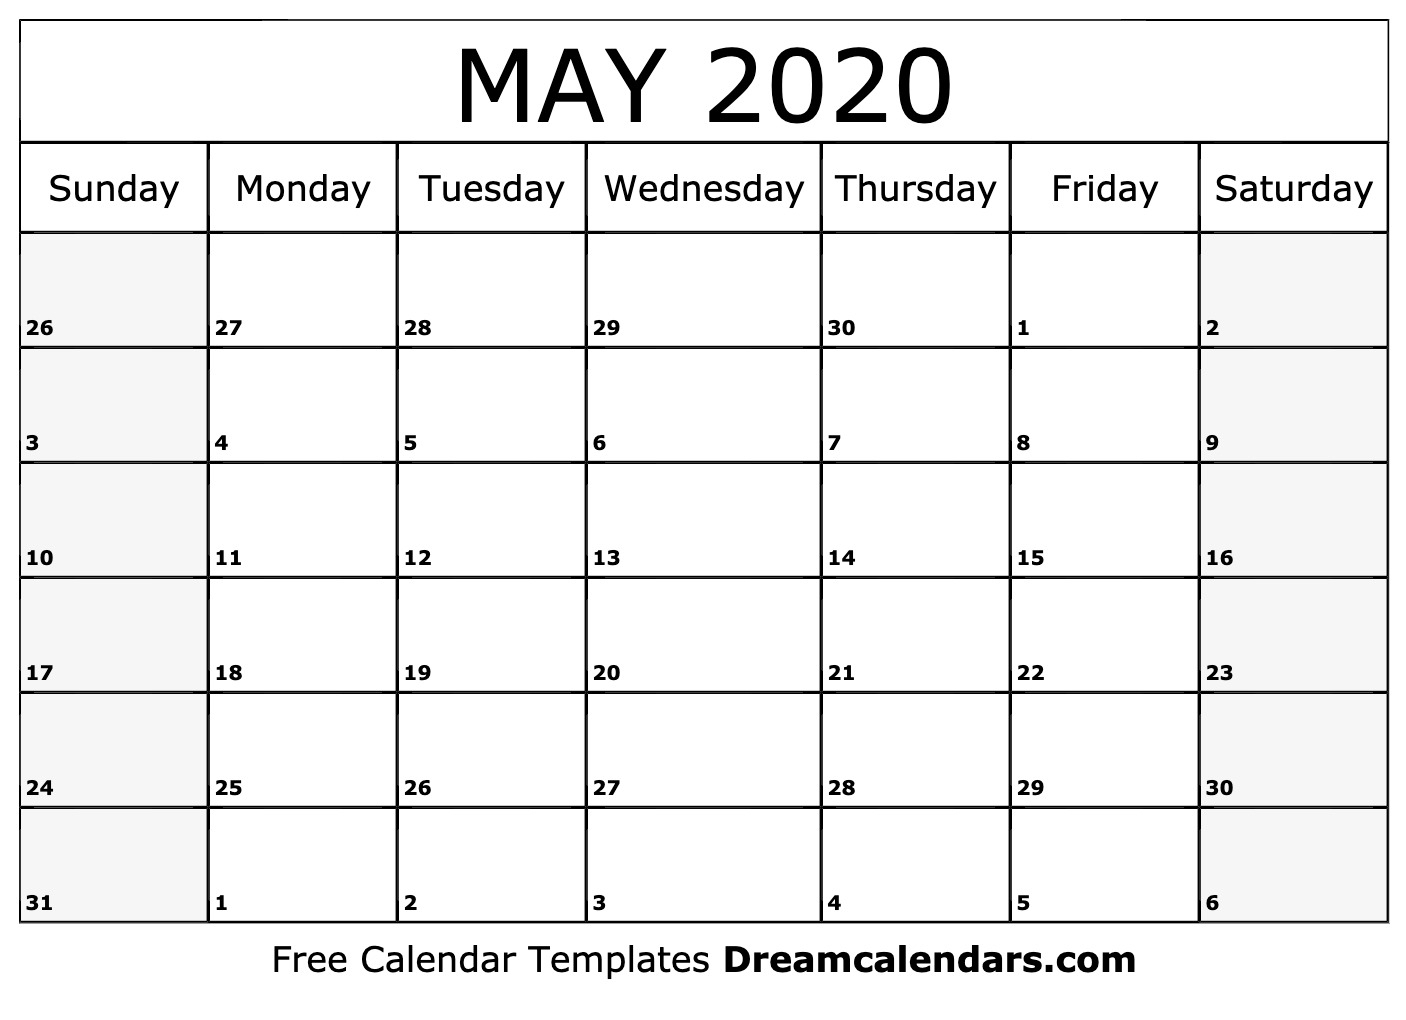 2020 May Printable Calendar - Tunu.redmini.co